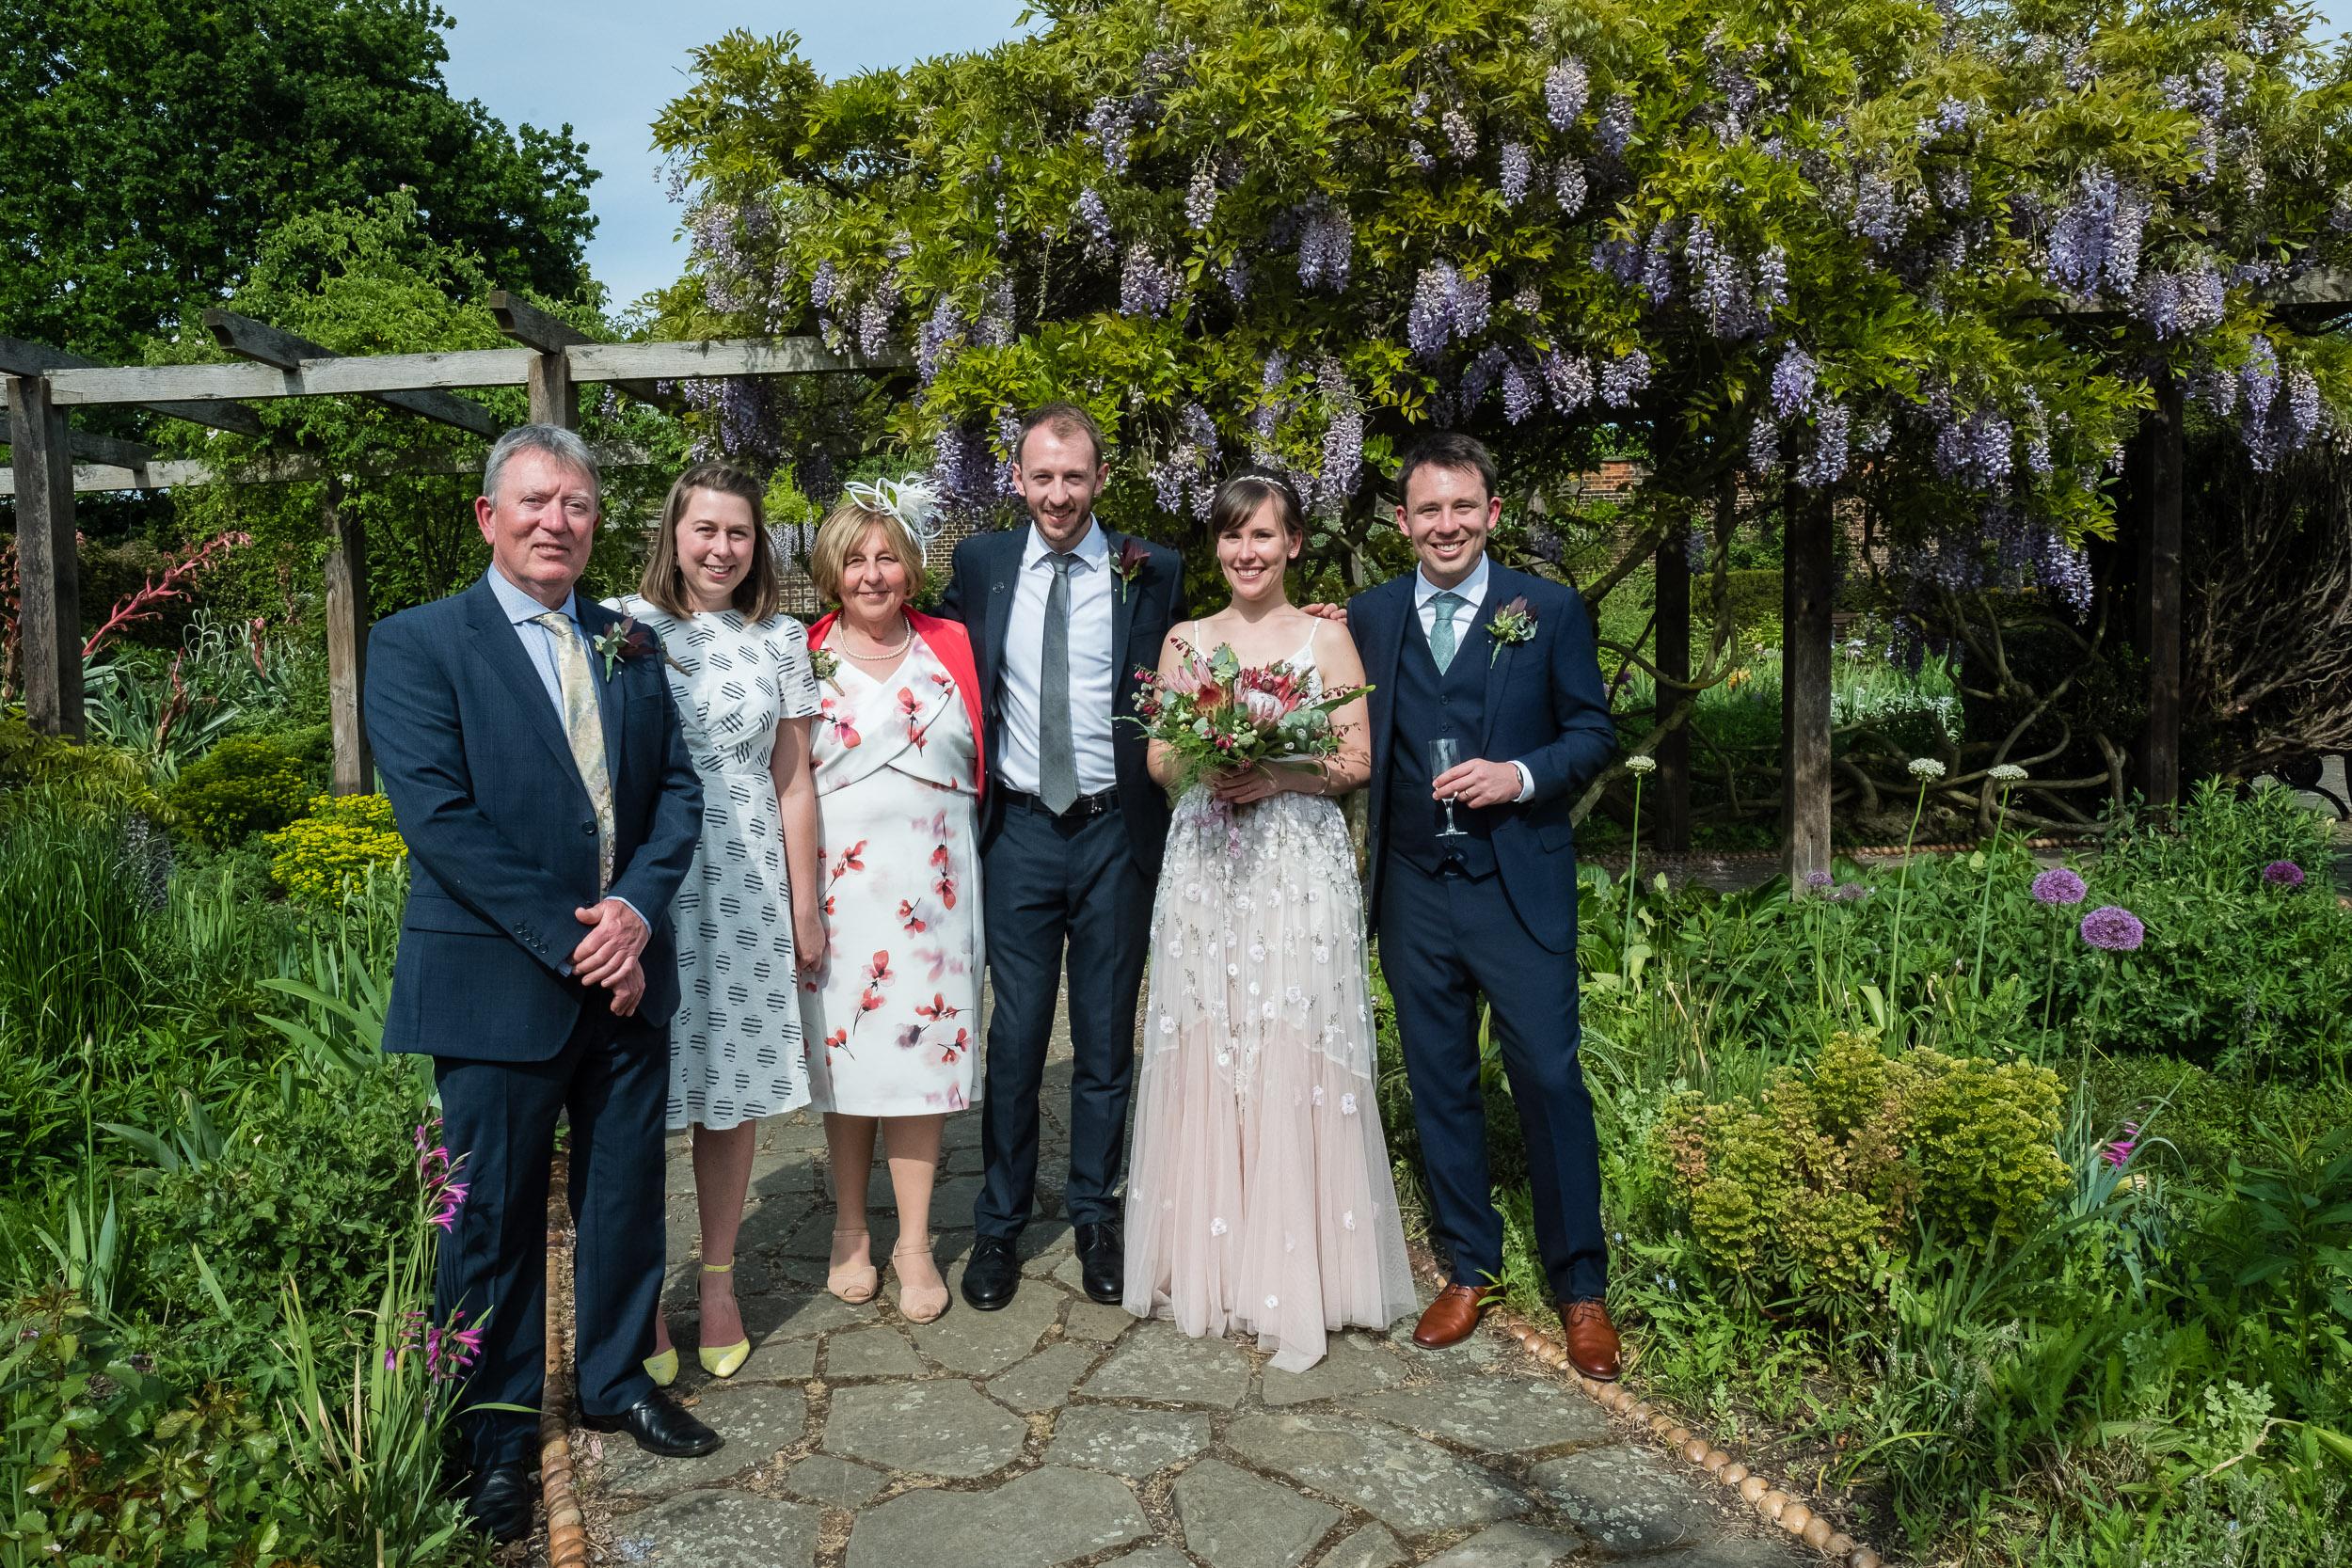 brockwell-lido-brixton-herne-hill-wedding-255.jpg